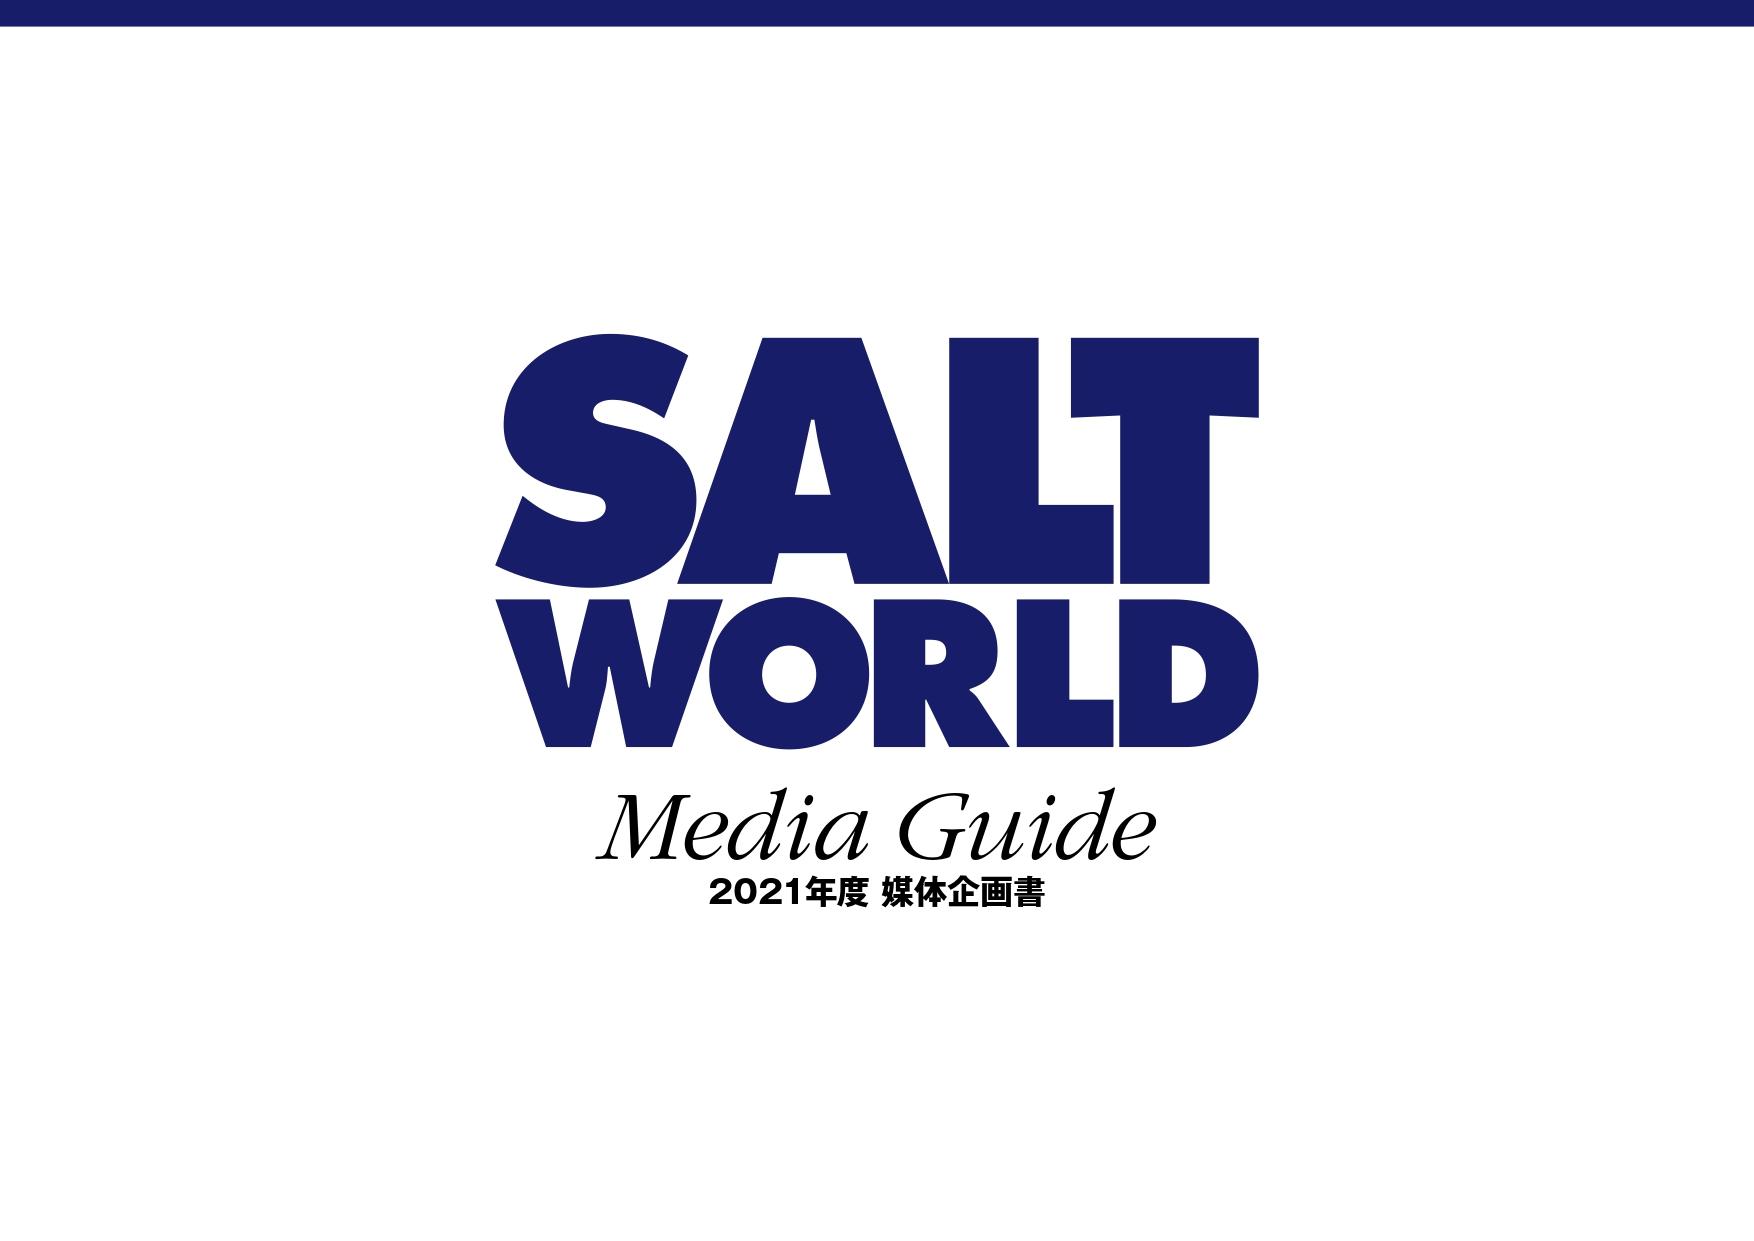 SALTWORLD_H1 修正_page-0001